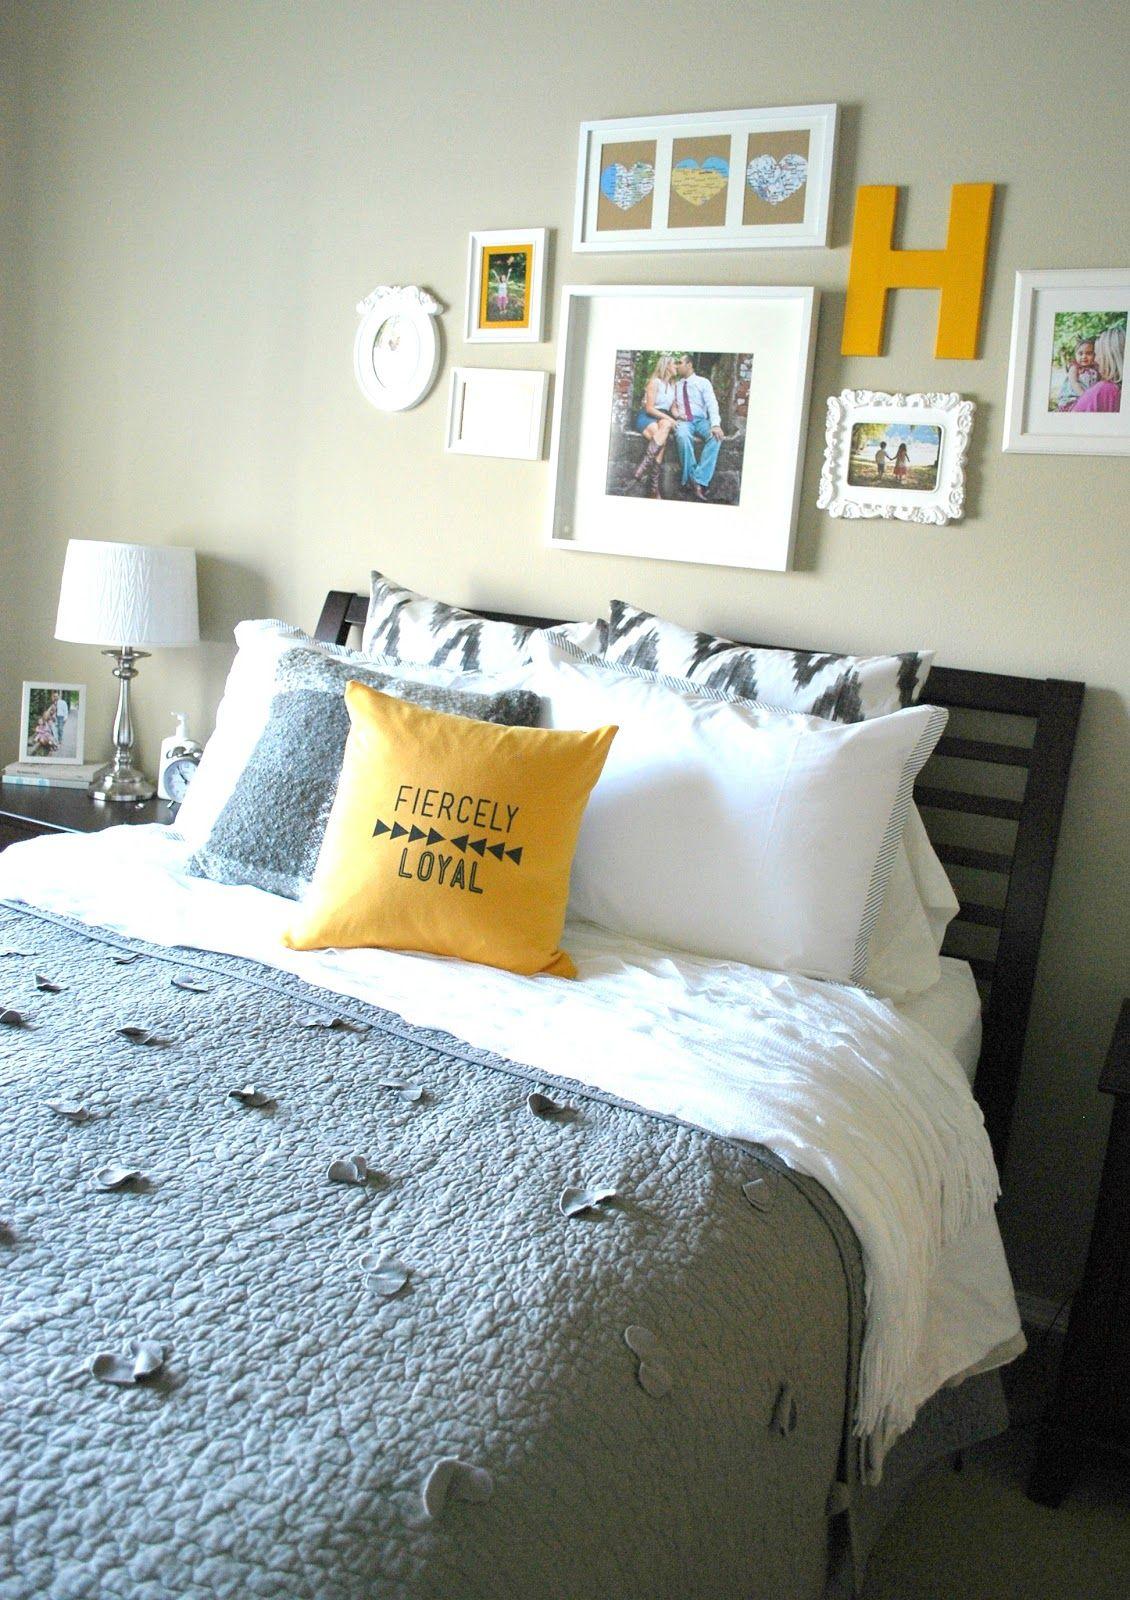 Master bedroom art above bed  pics  Mi casa es su casa  Pinterest  Master bedroom Bedrooms